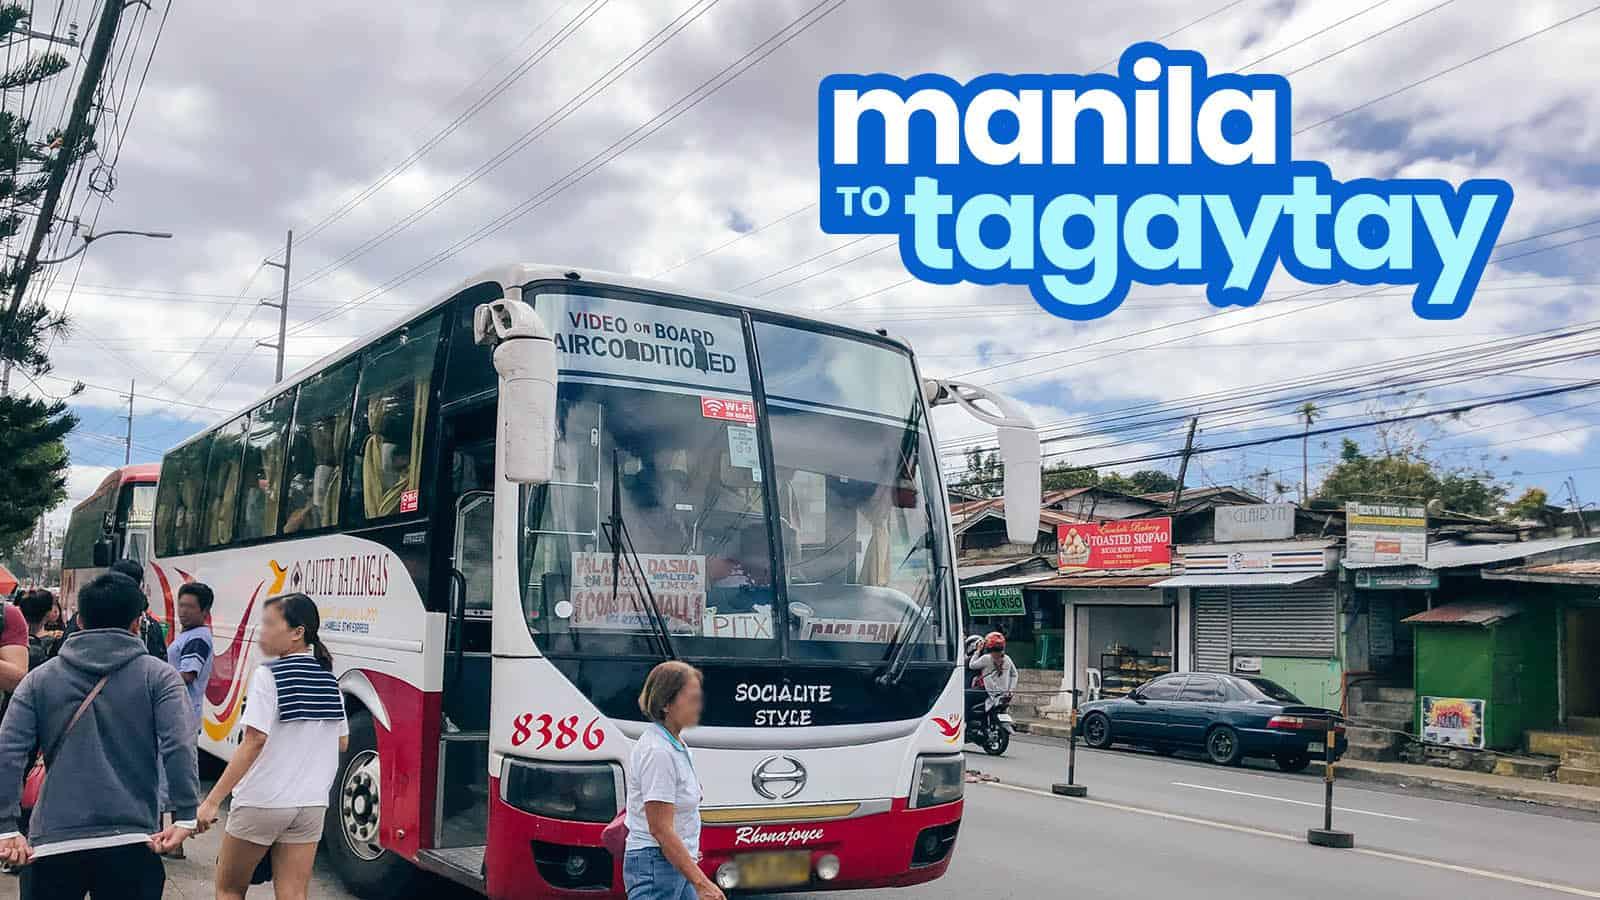 HOW TO GET TO TAGAYTAY: Manila to Sky Ranch, Olivarez & Wind Residences